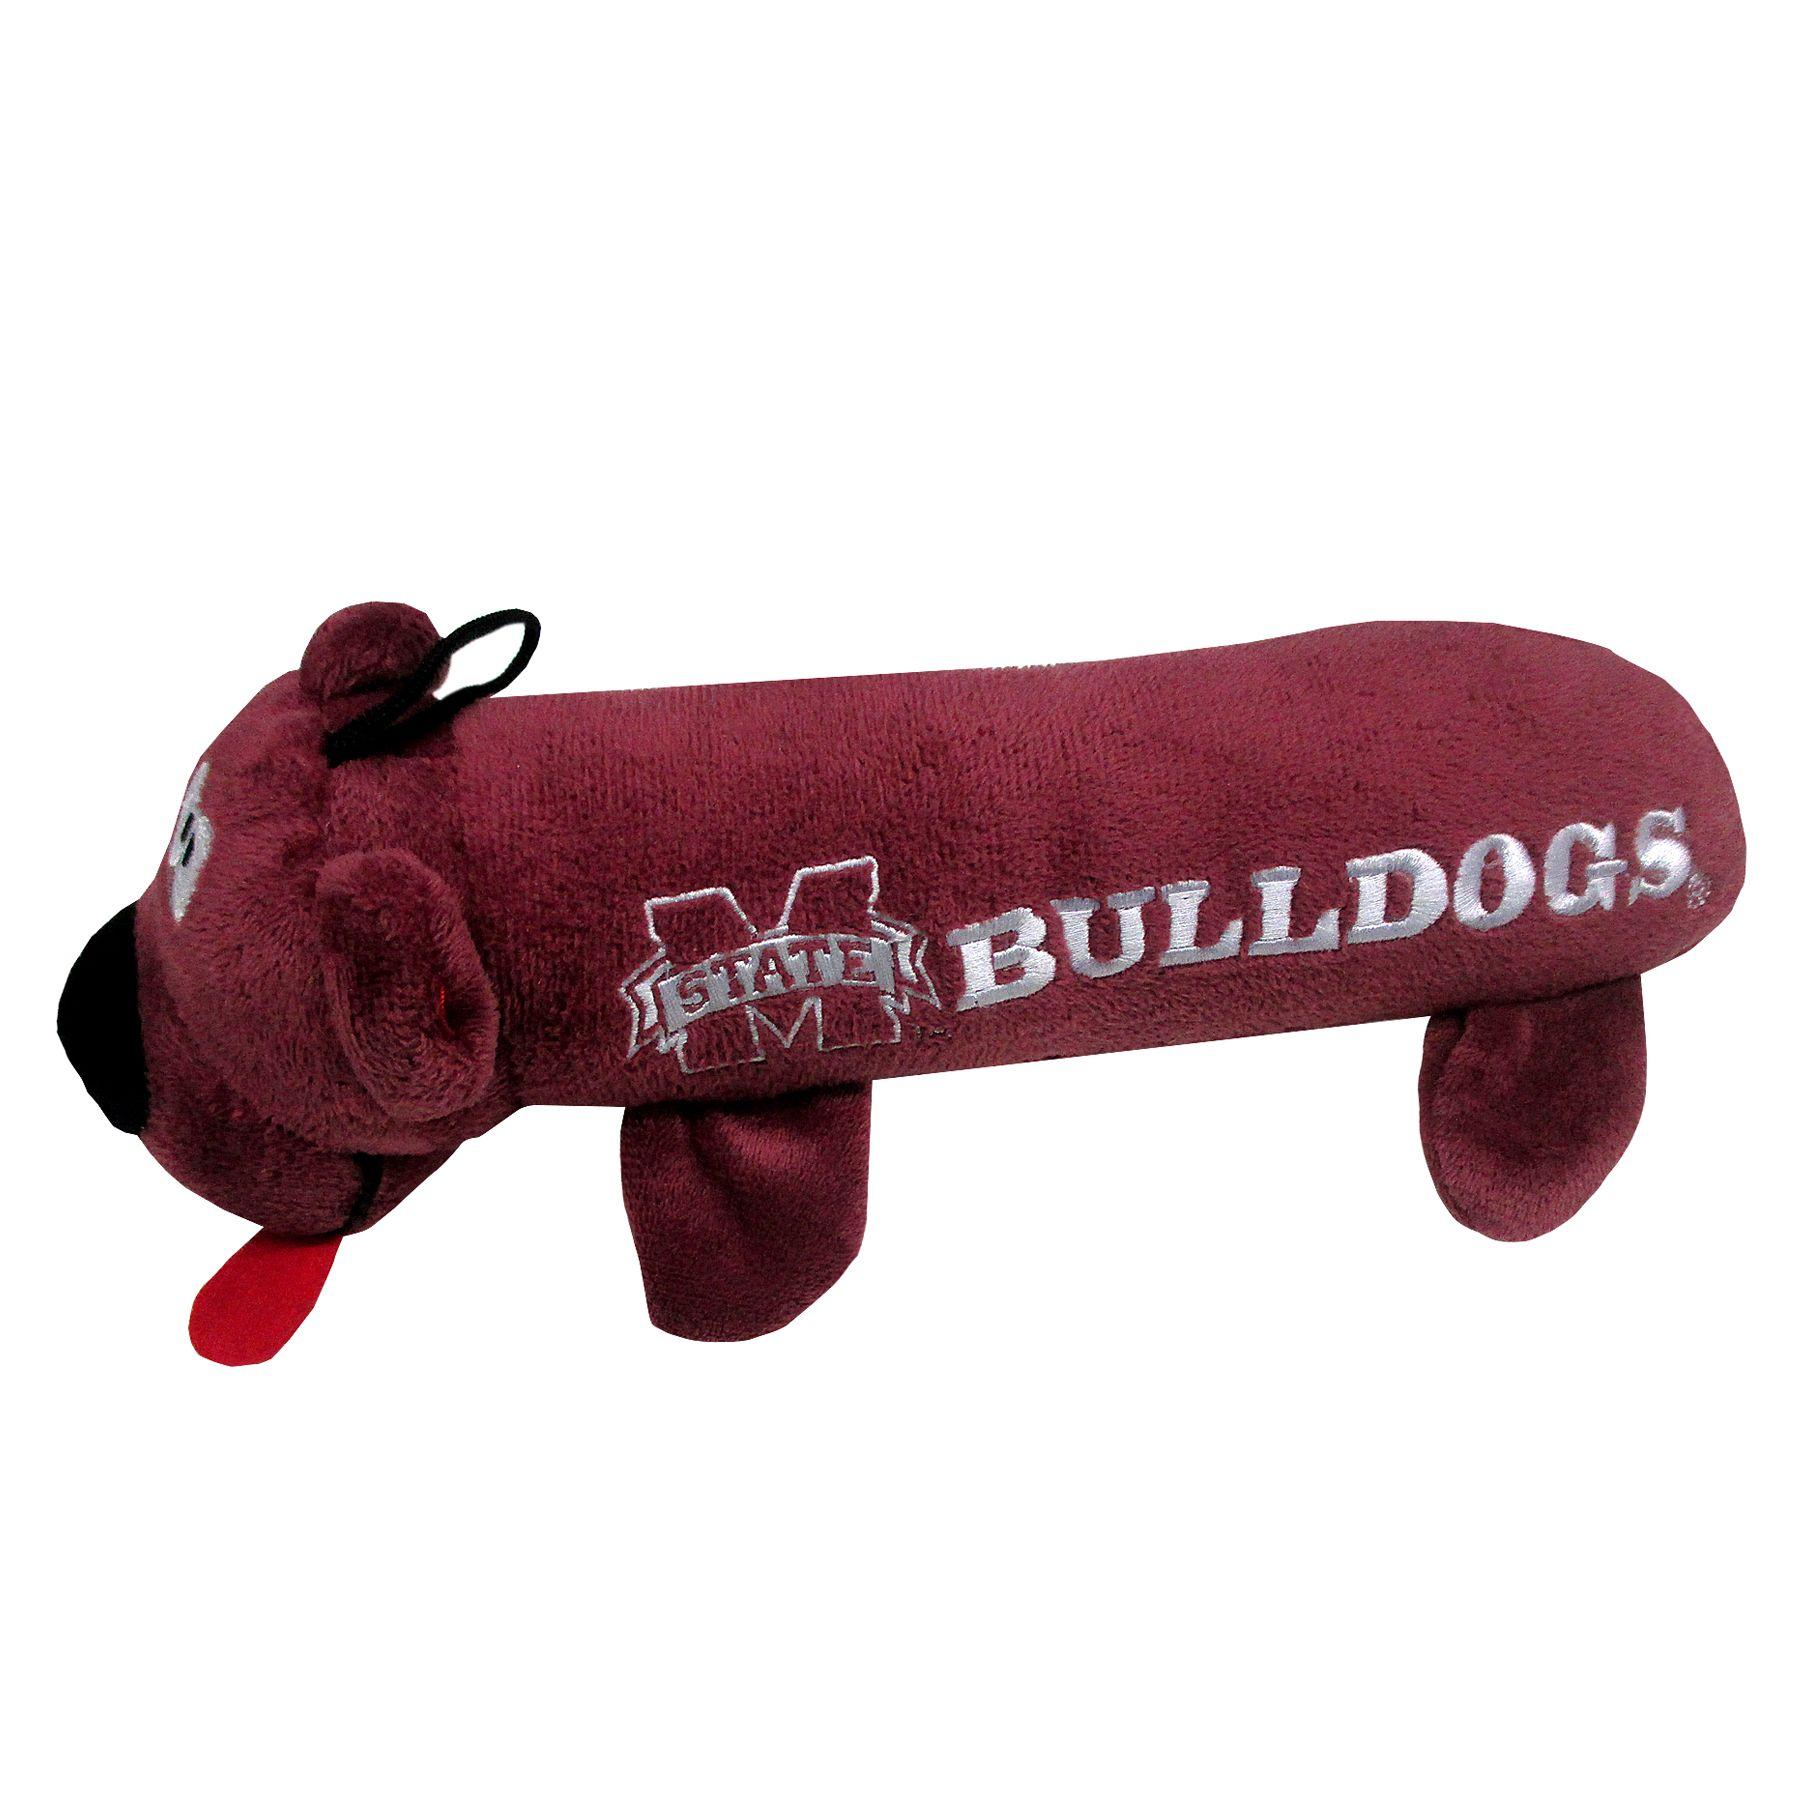 Mississippi State University Bulldogs Ncaa Tube Dog Toy 5243451